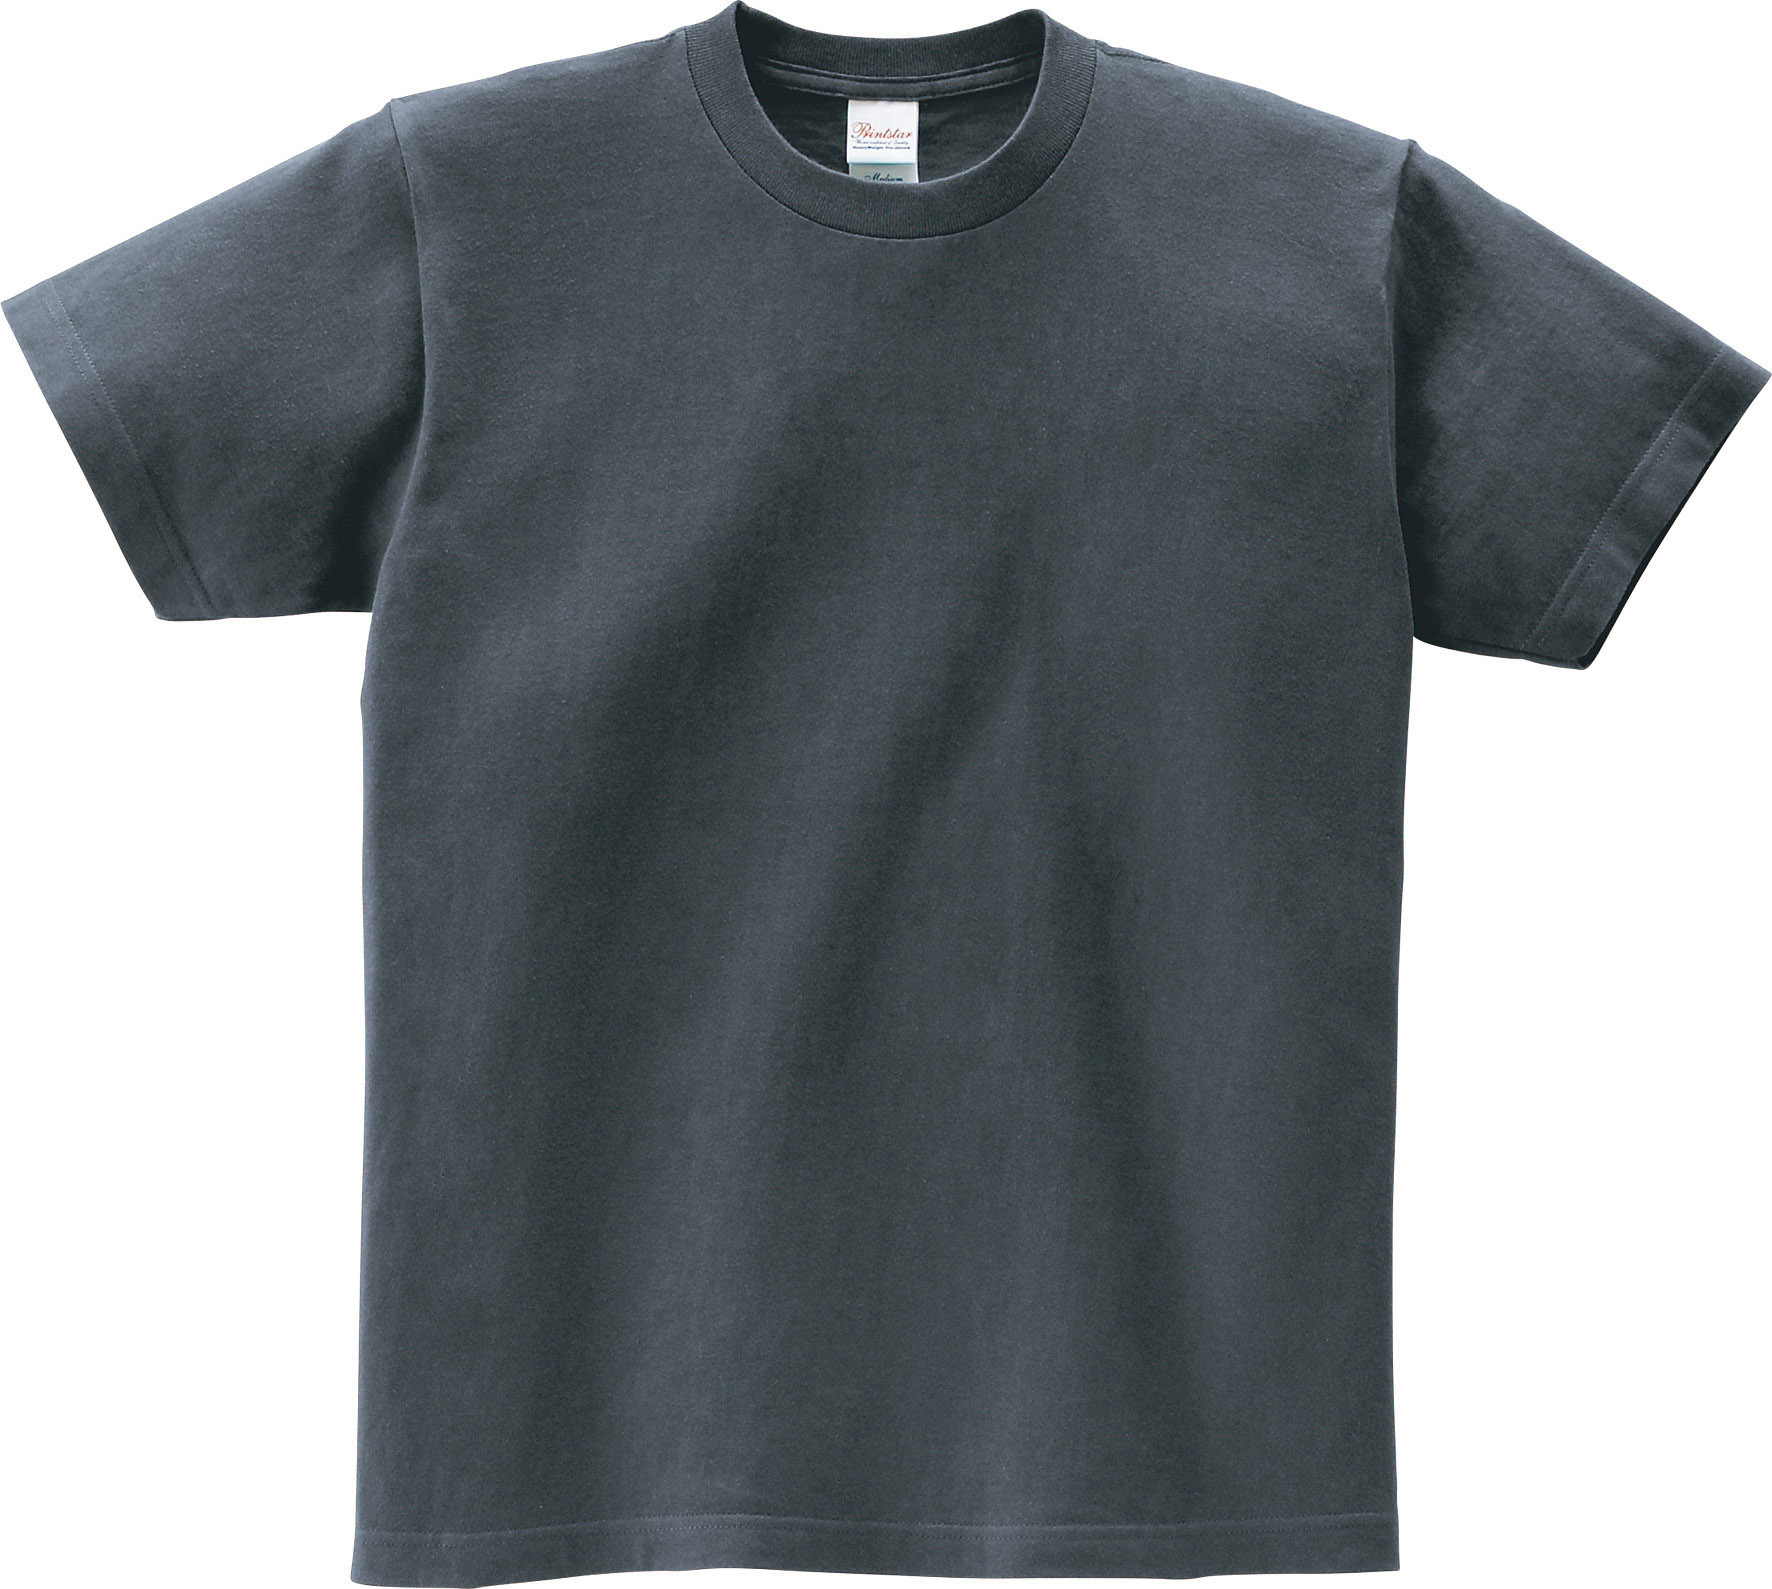 00085-CVT 5.6オンス・ヘビーウェイトTシャツ - 109-デニム, XXXL